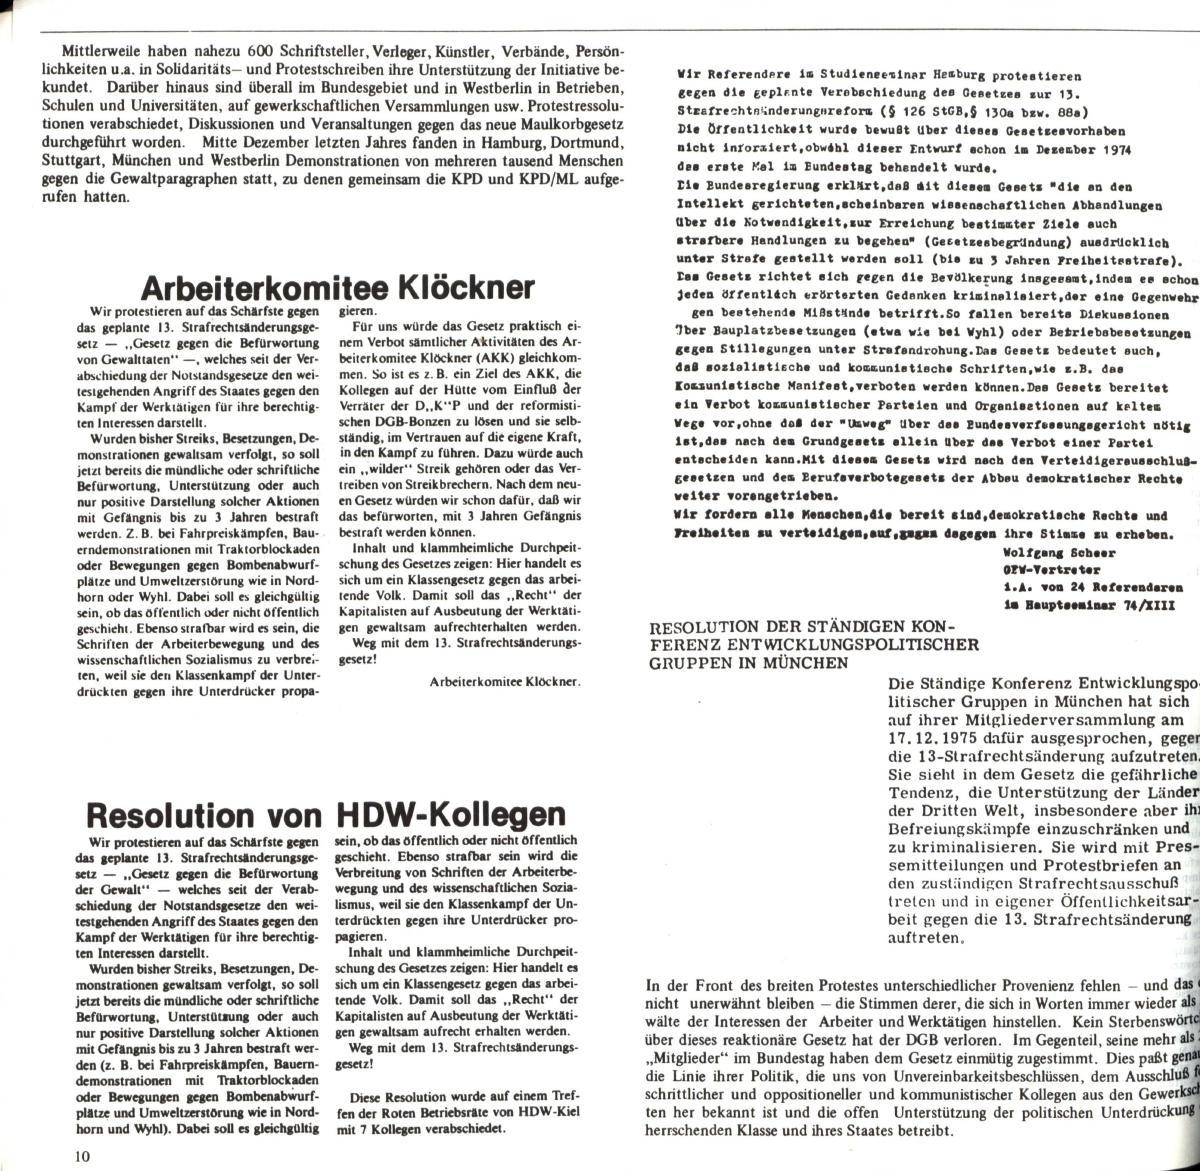 REP_VLB_1976_Die_Zensurgesetze_11